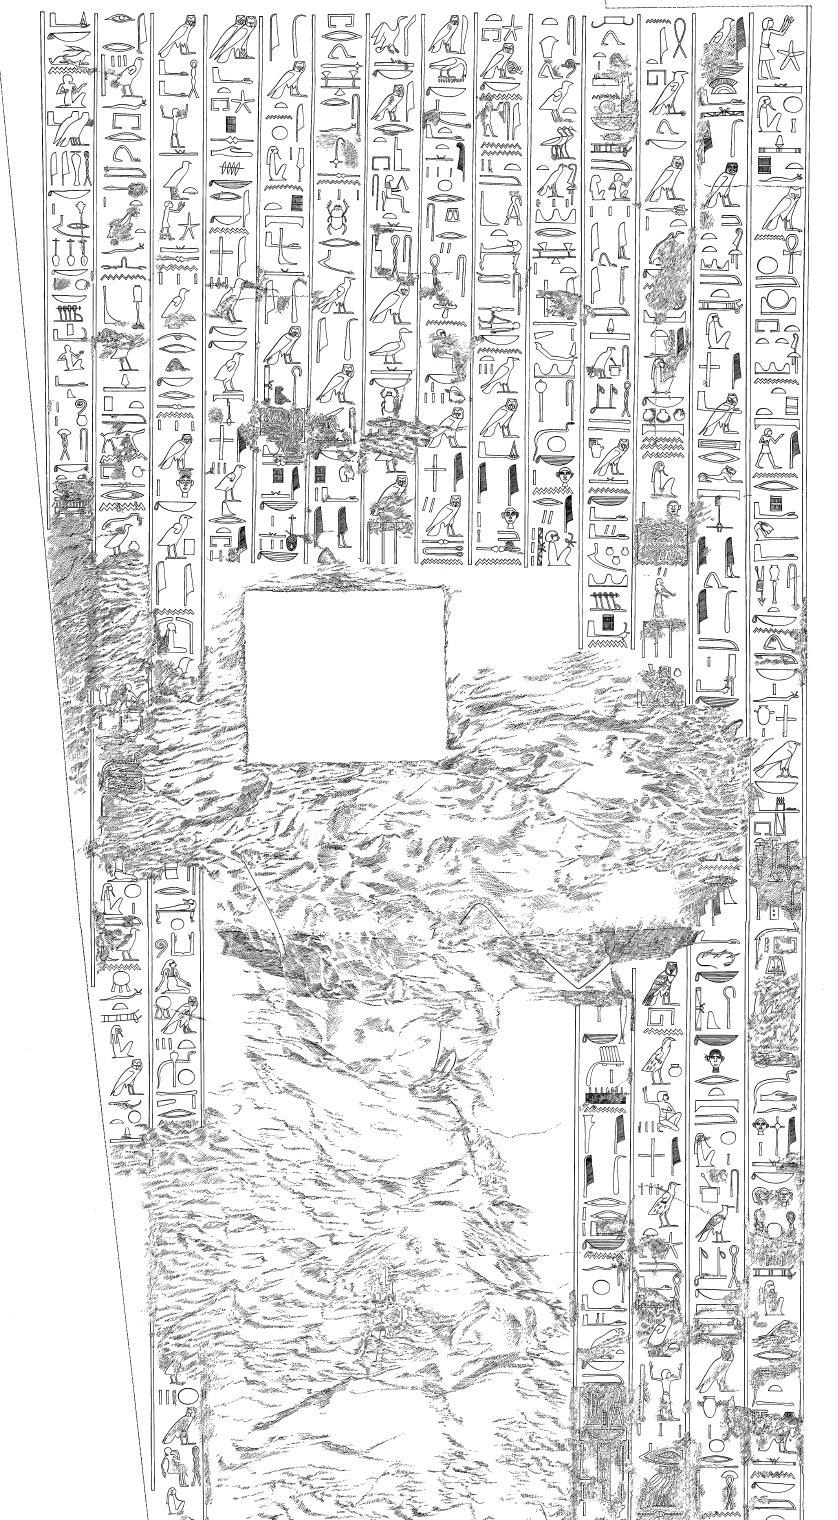 117. Kheruef Setting Sun (OIP 1980 plate 7)